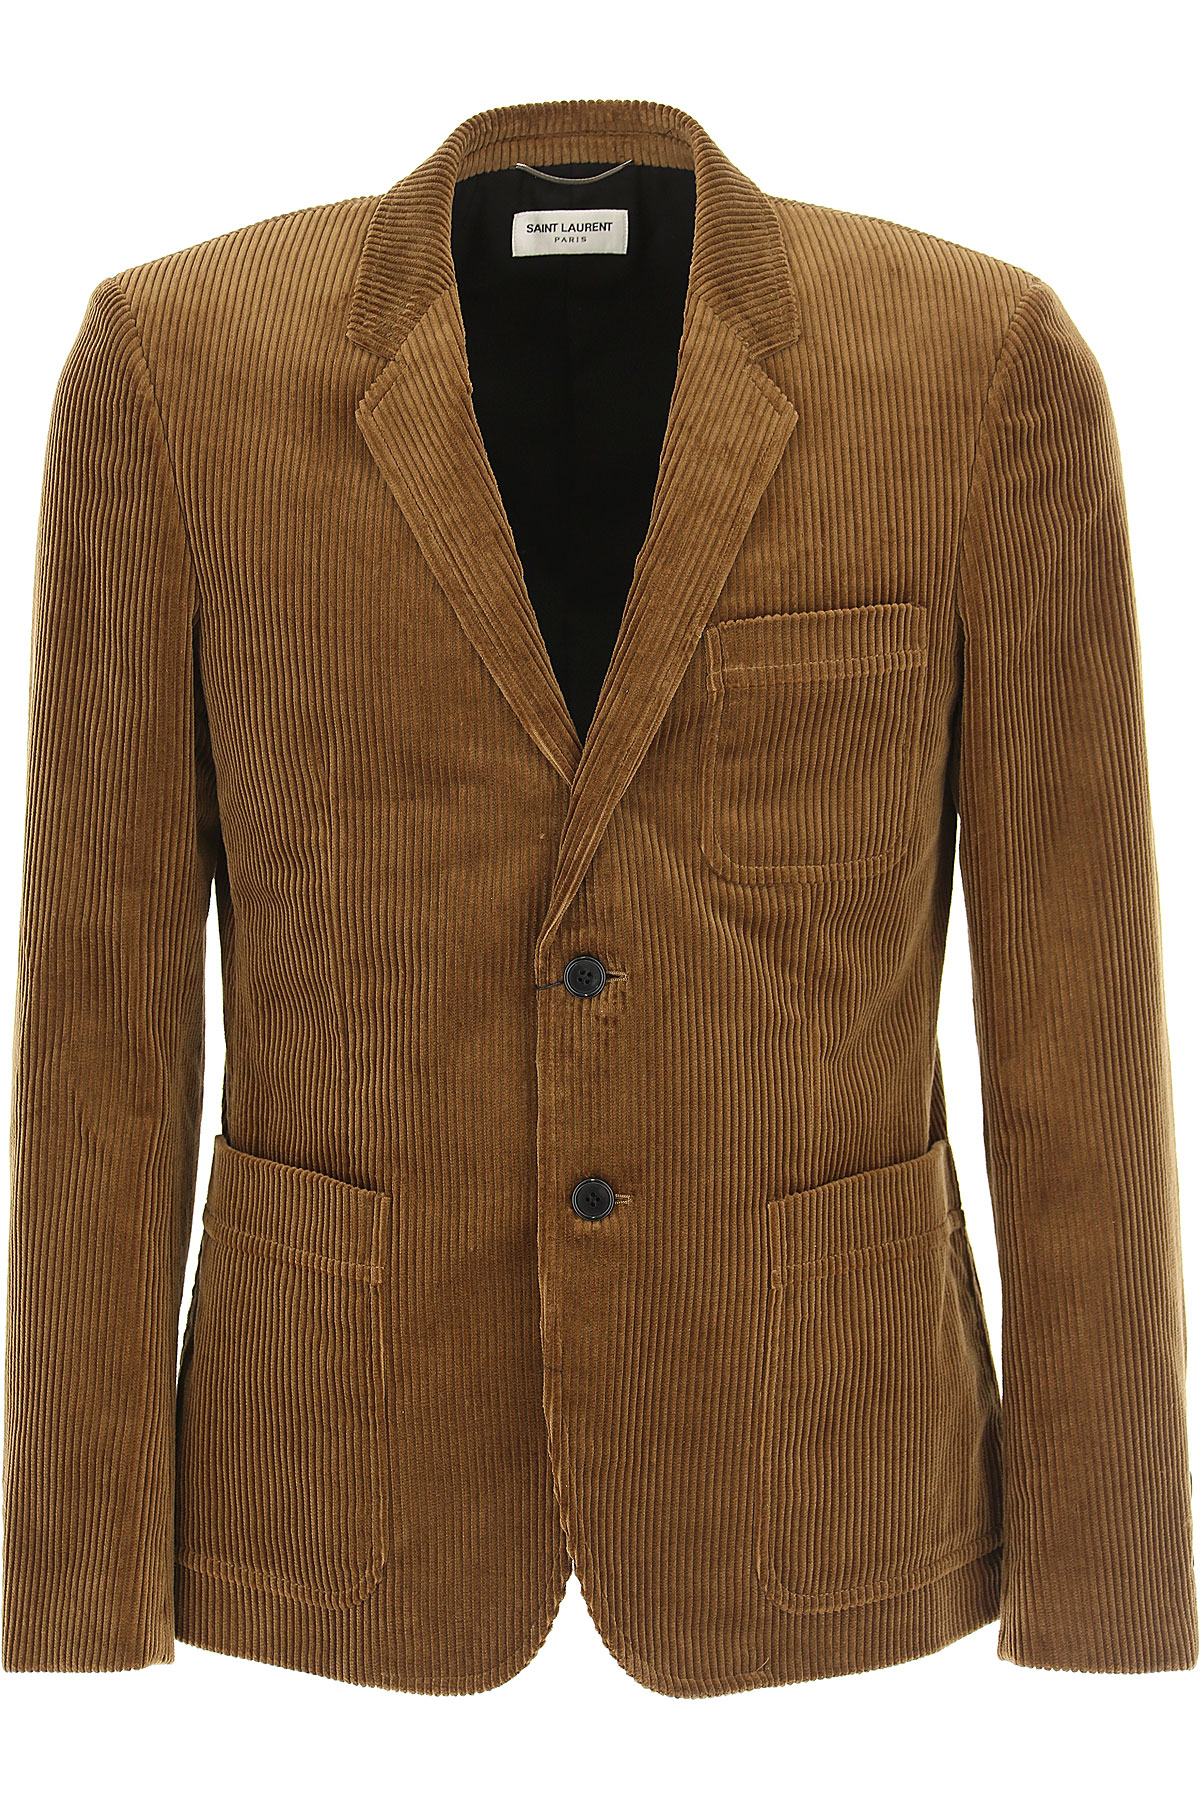 Image of Yves Saint Laurent Blazer for Men, Sport Coat, Brown, Cotton, 2017, L M